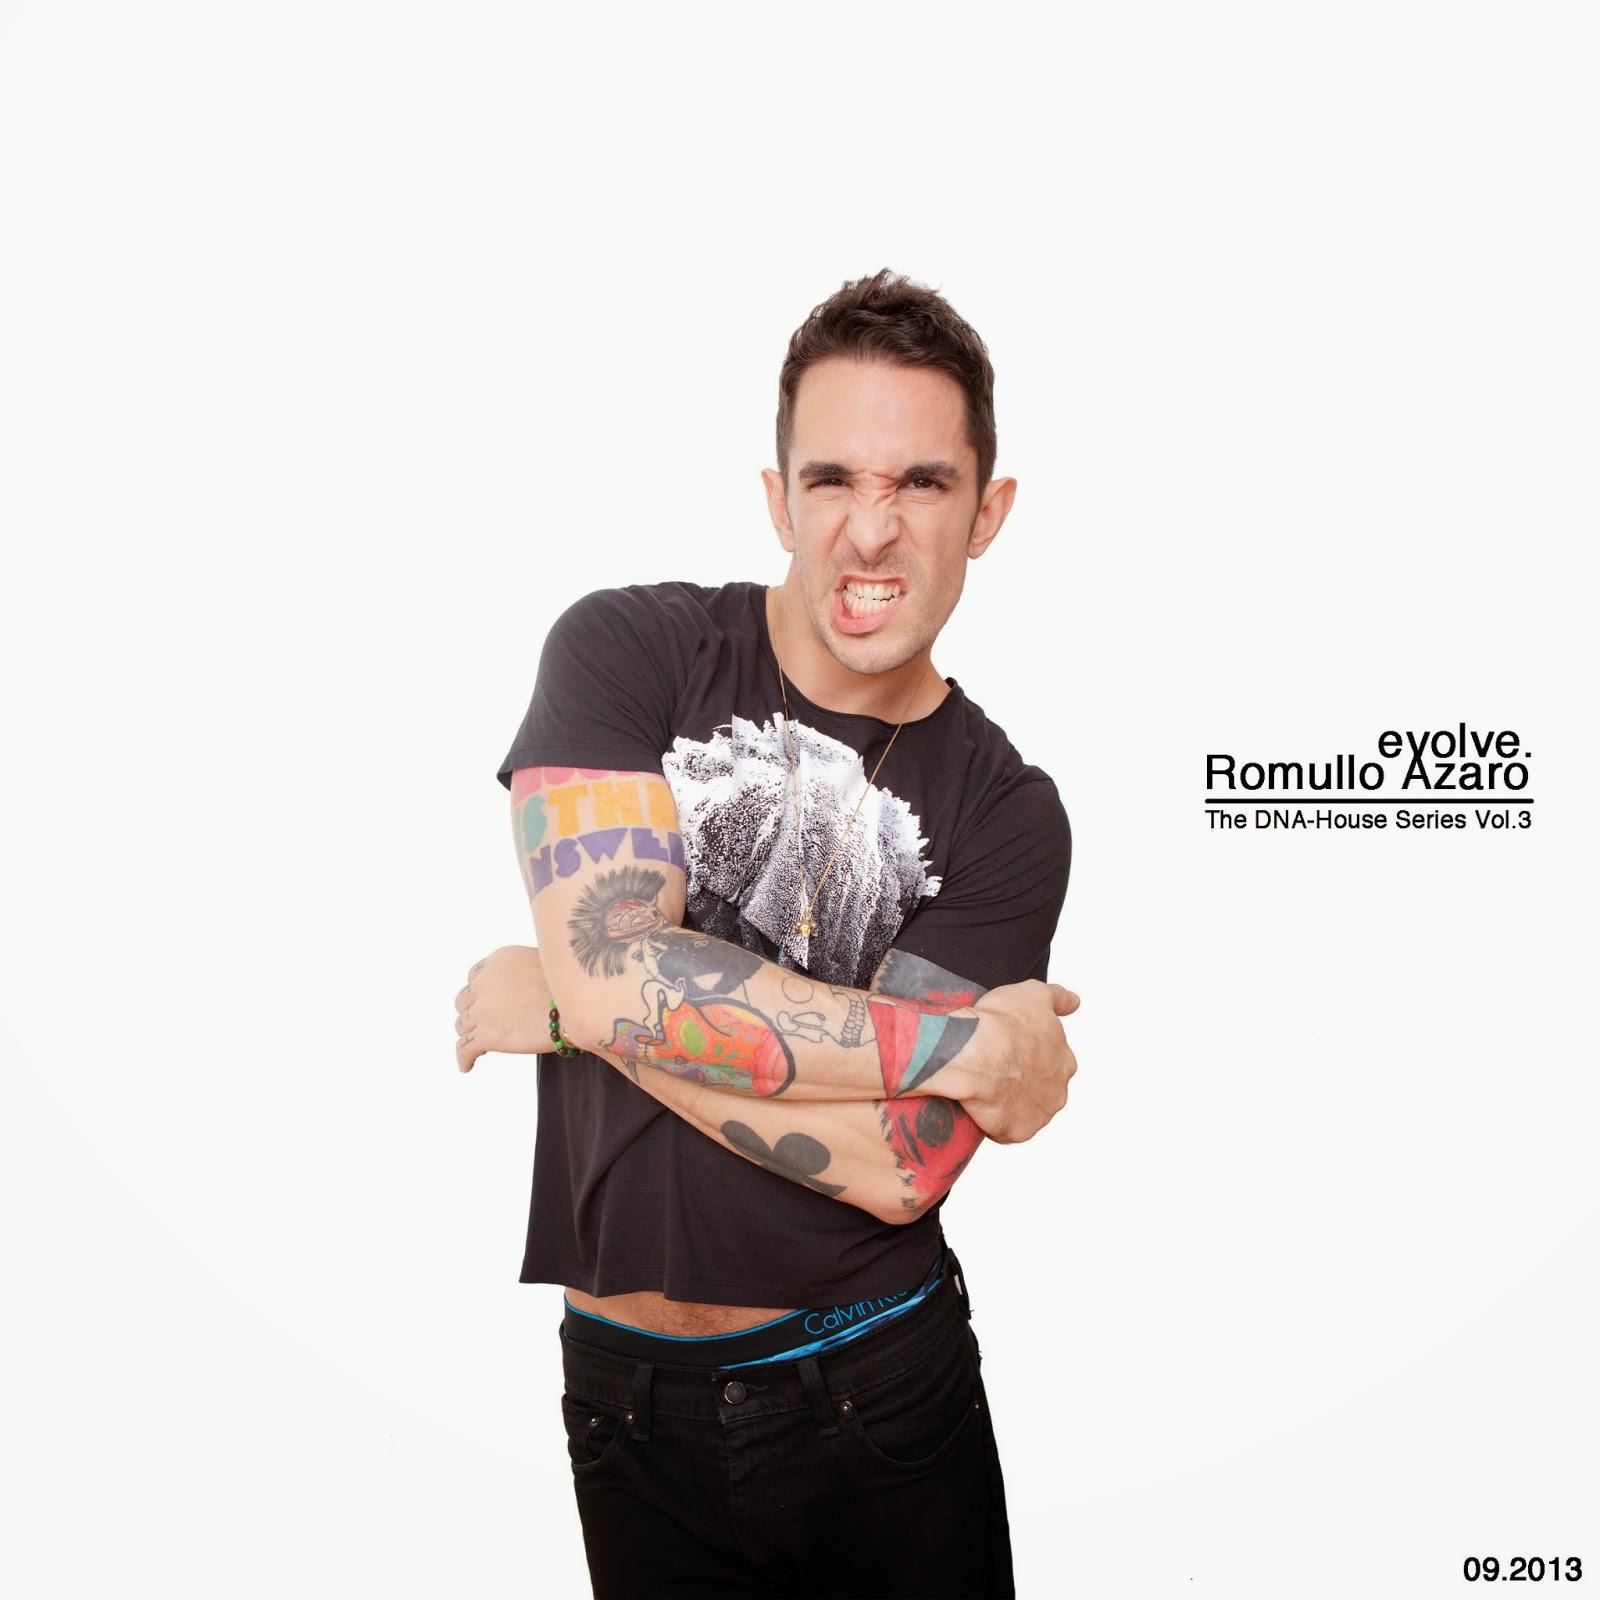 DJ Romullo Azaro - EVOLVE